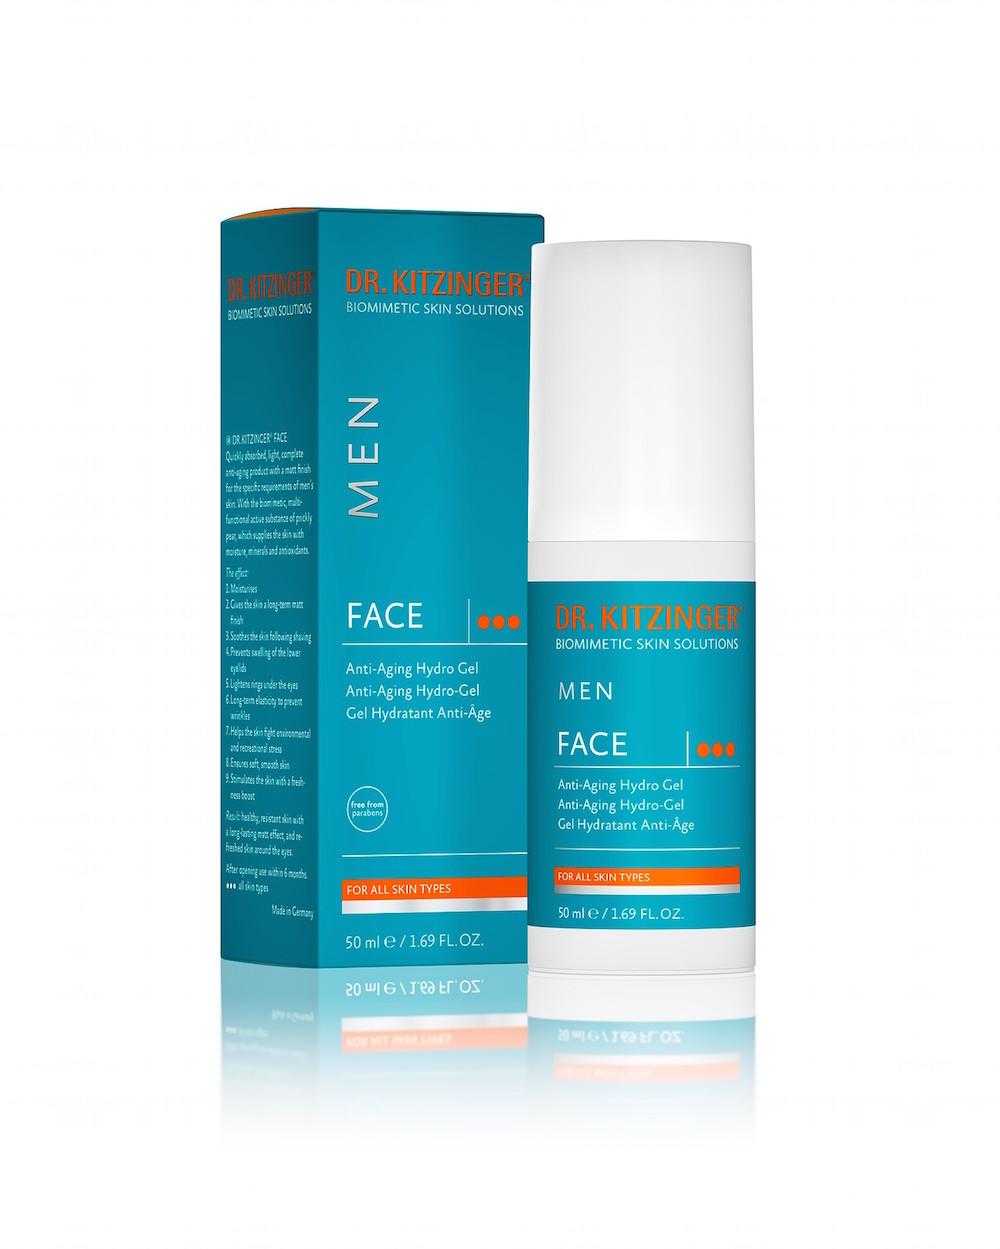 Dr. Kitzinger - Face - Anti-Aging Hydro Gel Gesichtspflege 50 ml